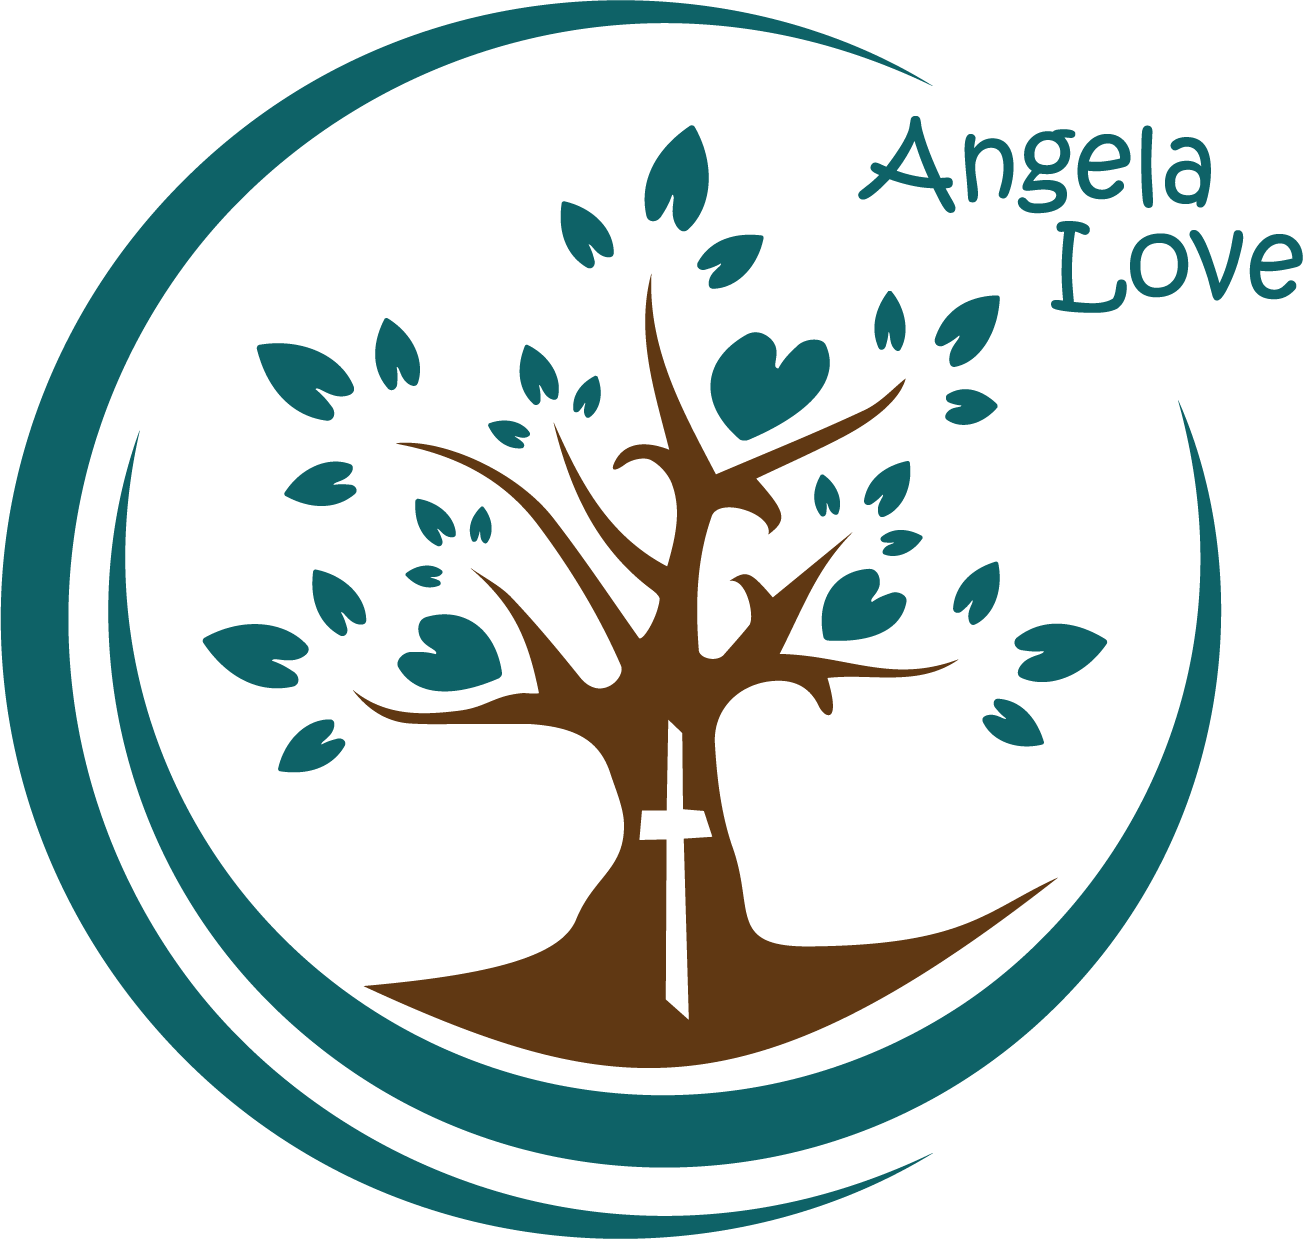 Angela Love